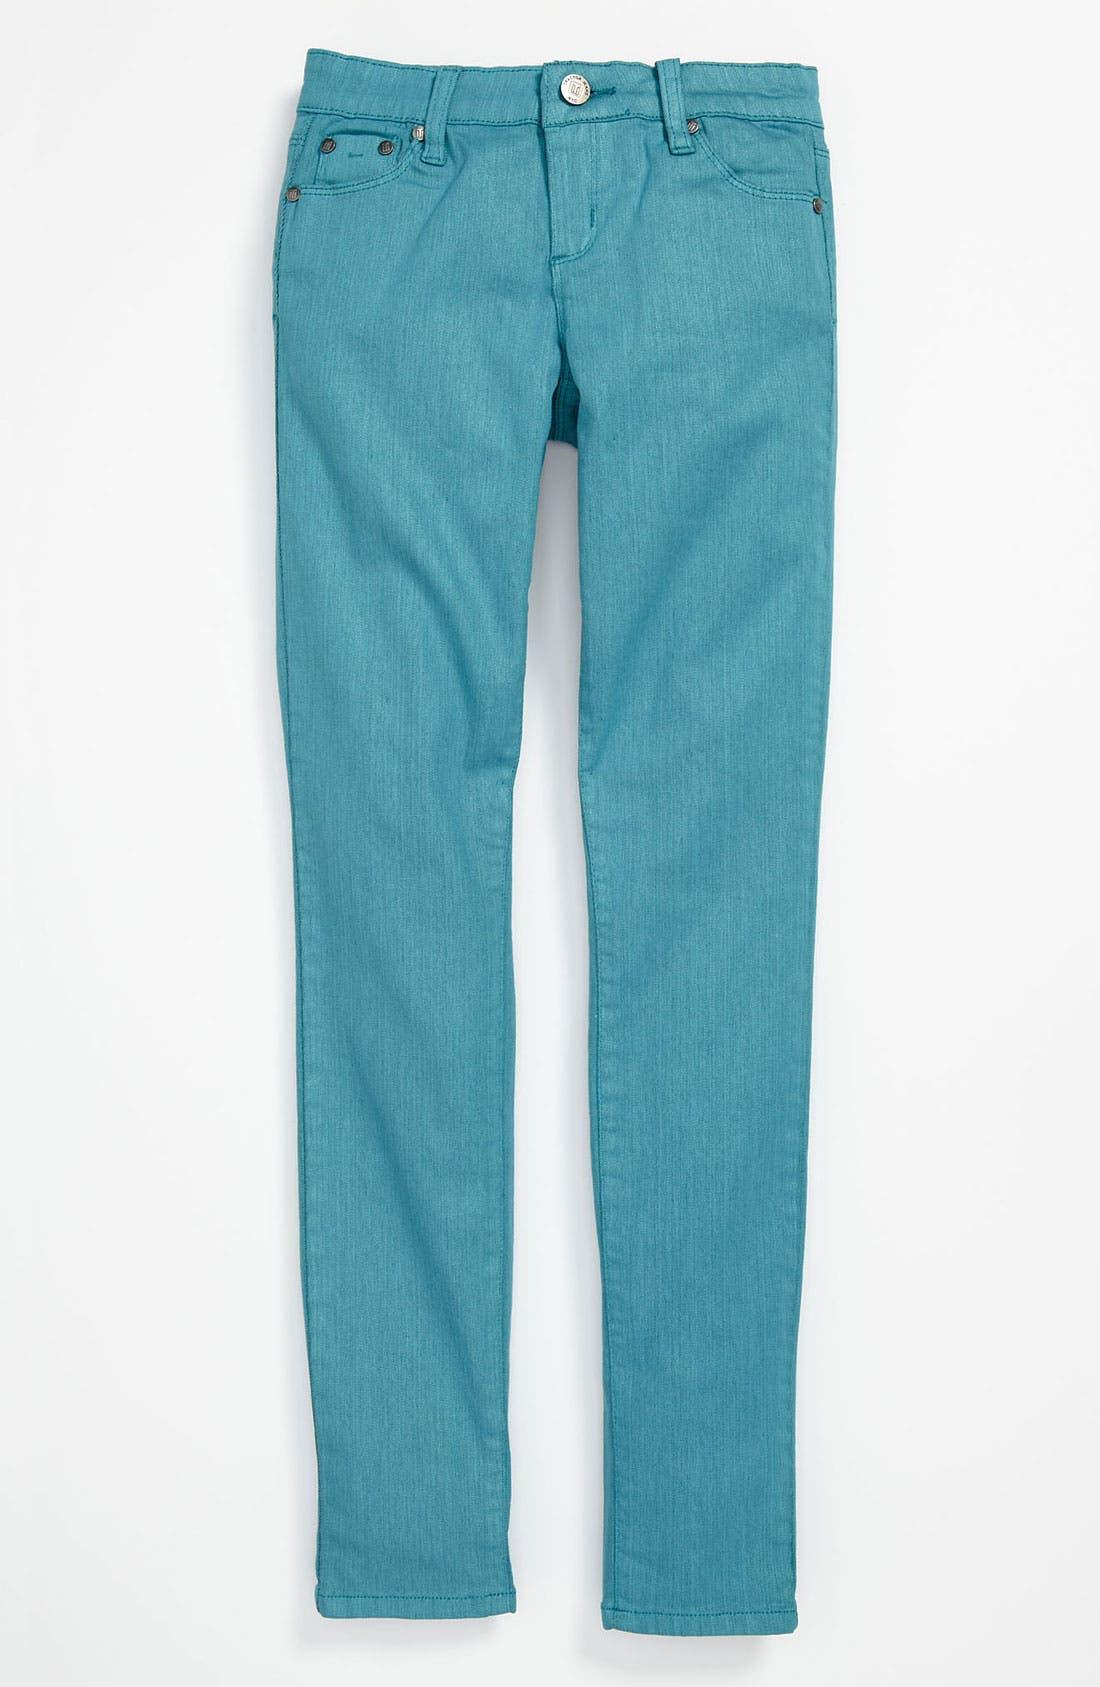 Alternate Image 2  - Tractr Coated Denim Skinny Leg Jeans (Big Girls)